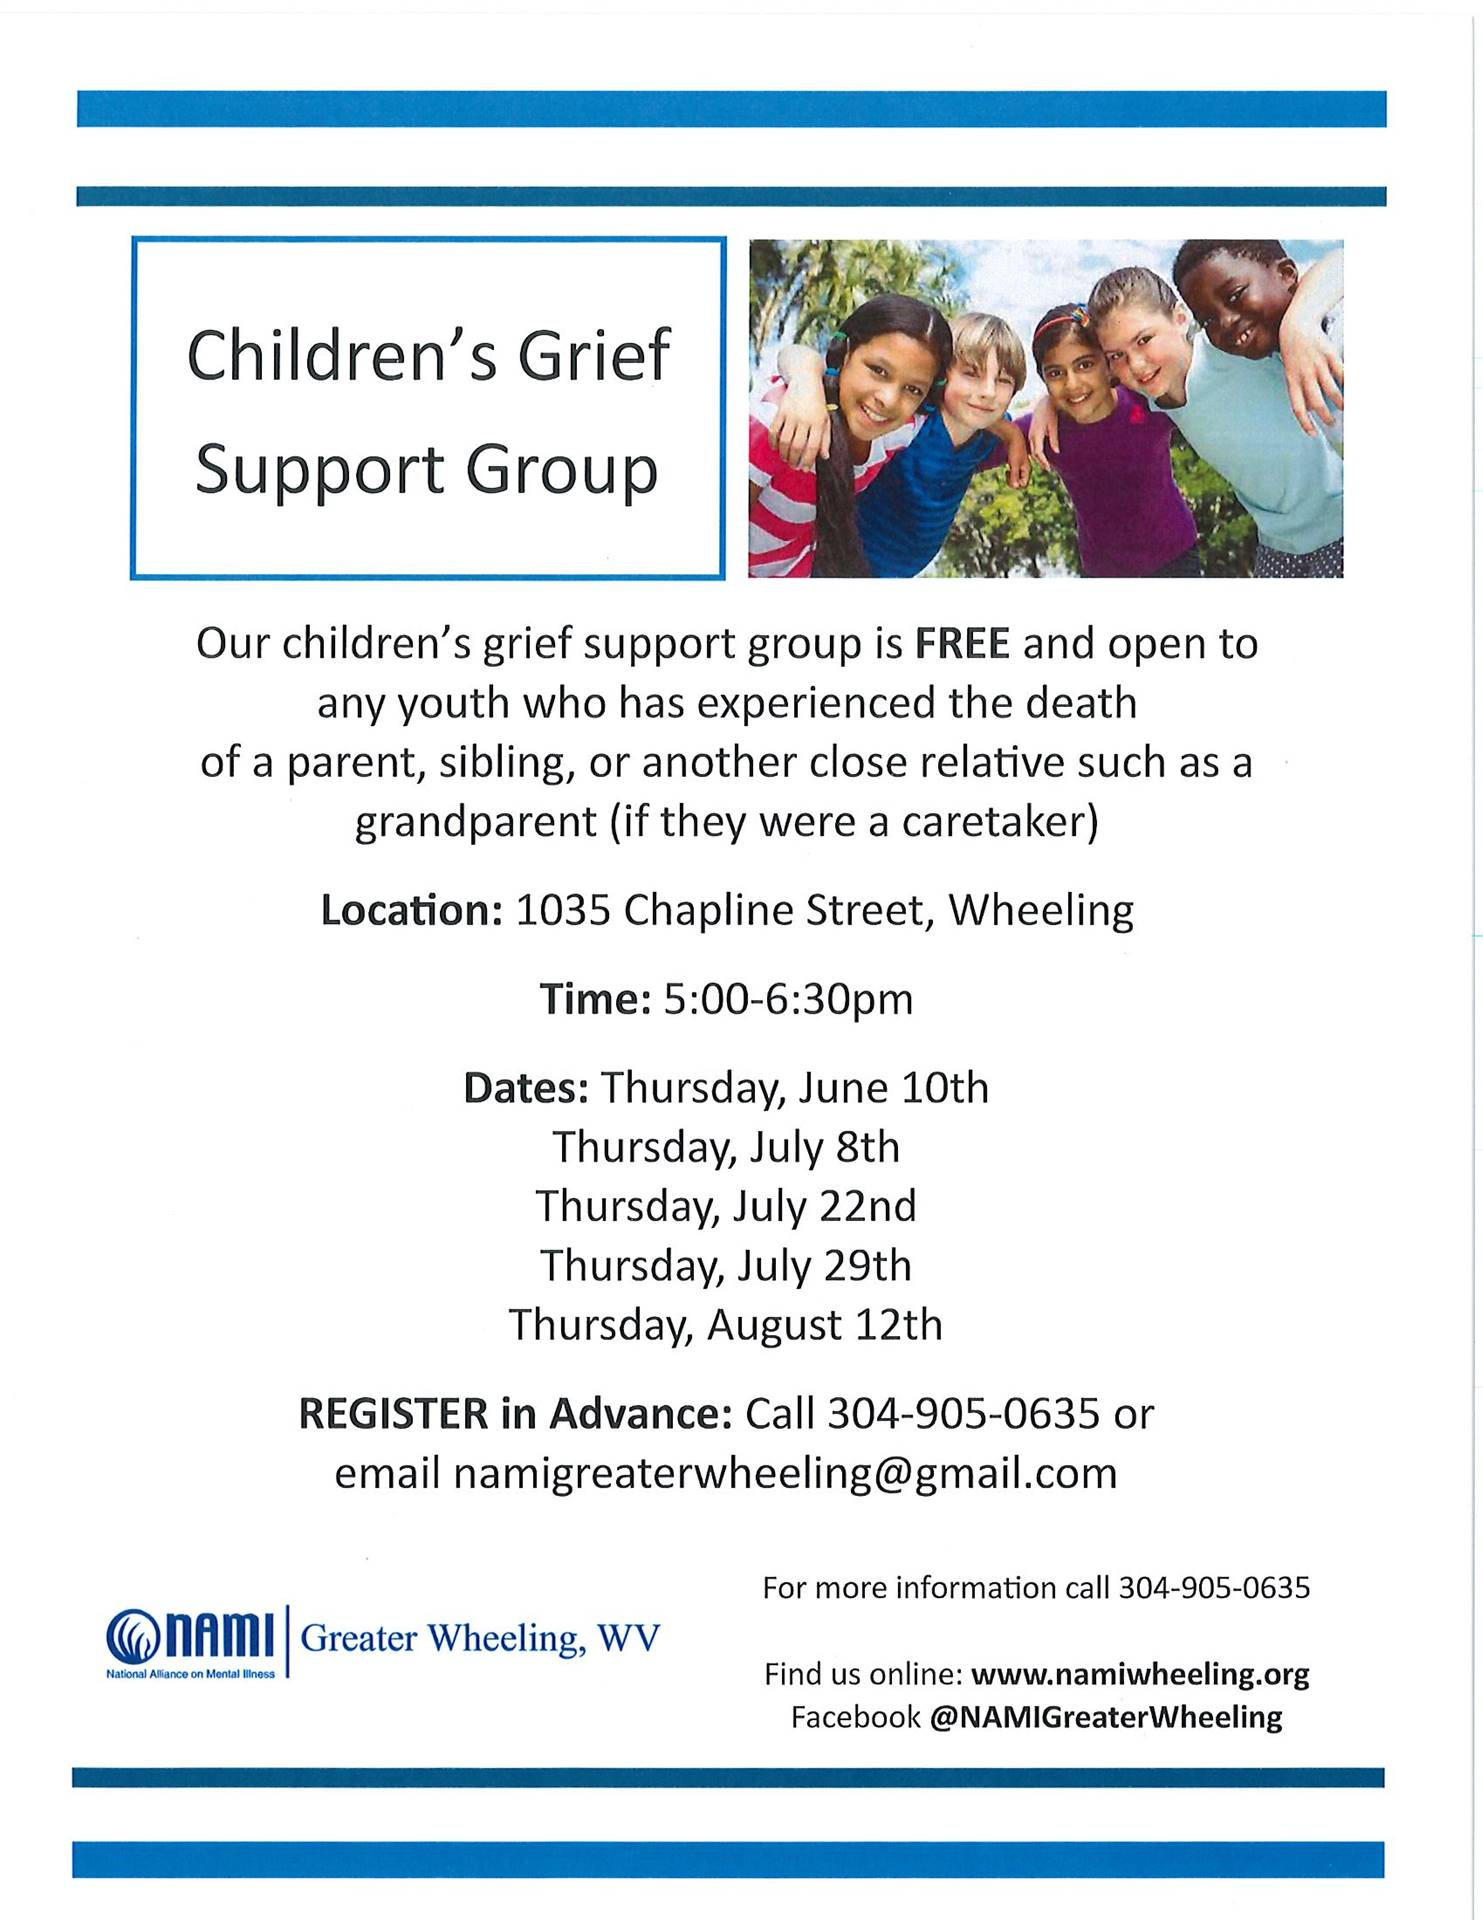 Children's Grief Support Group